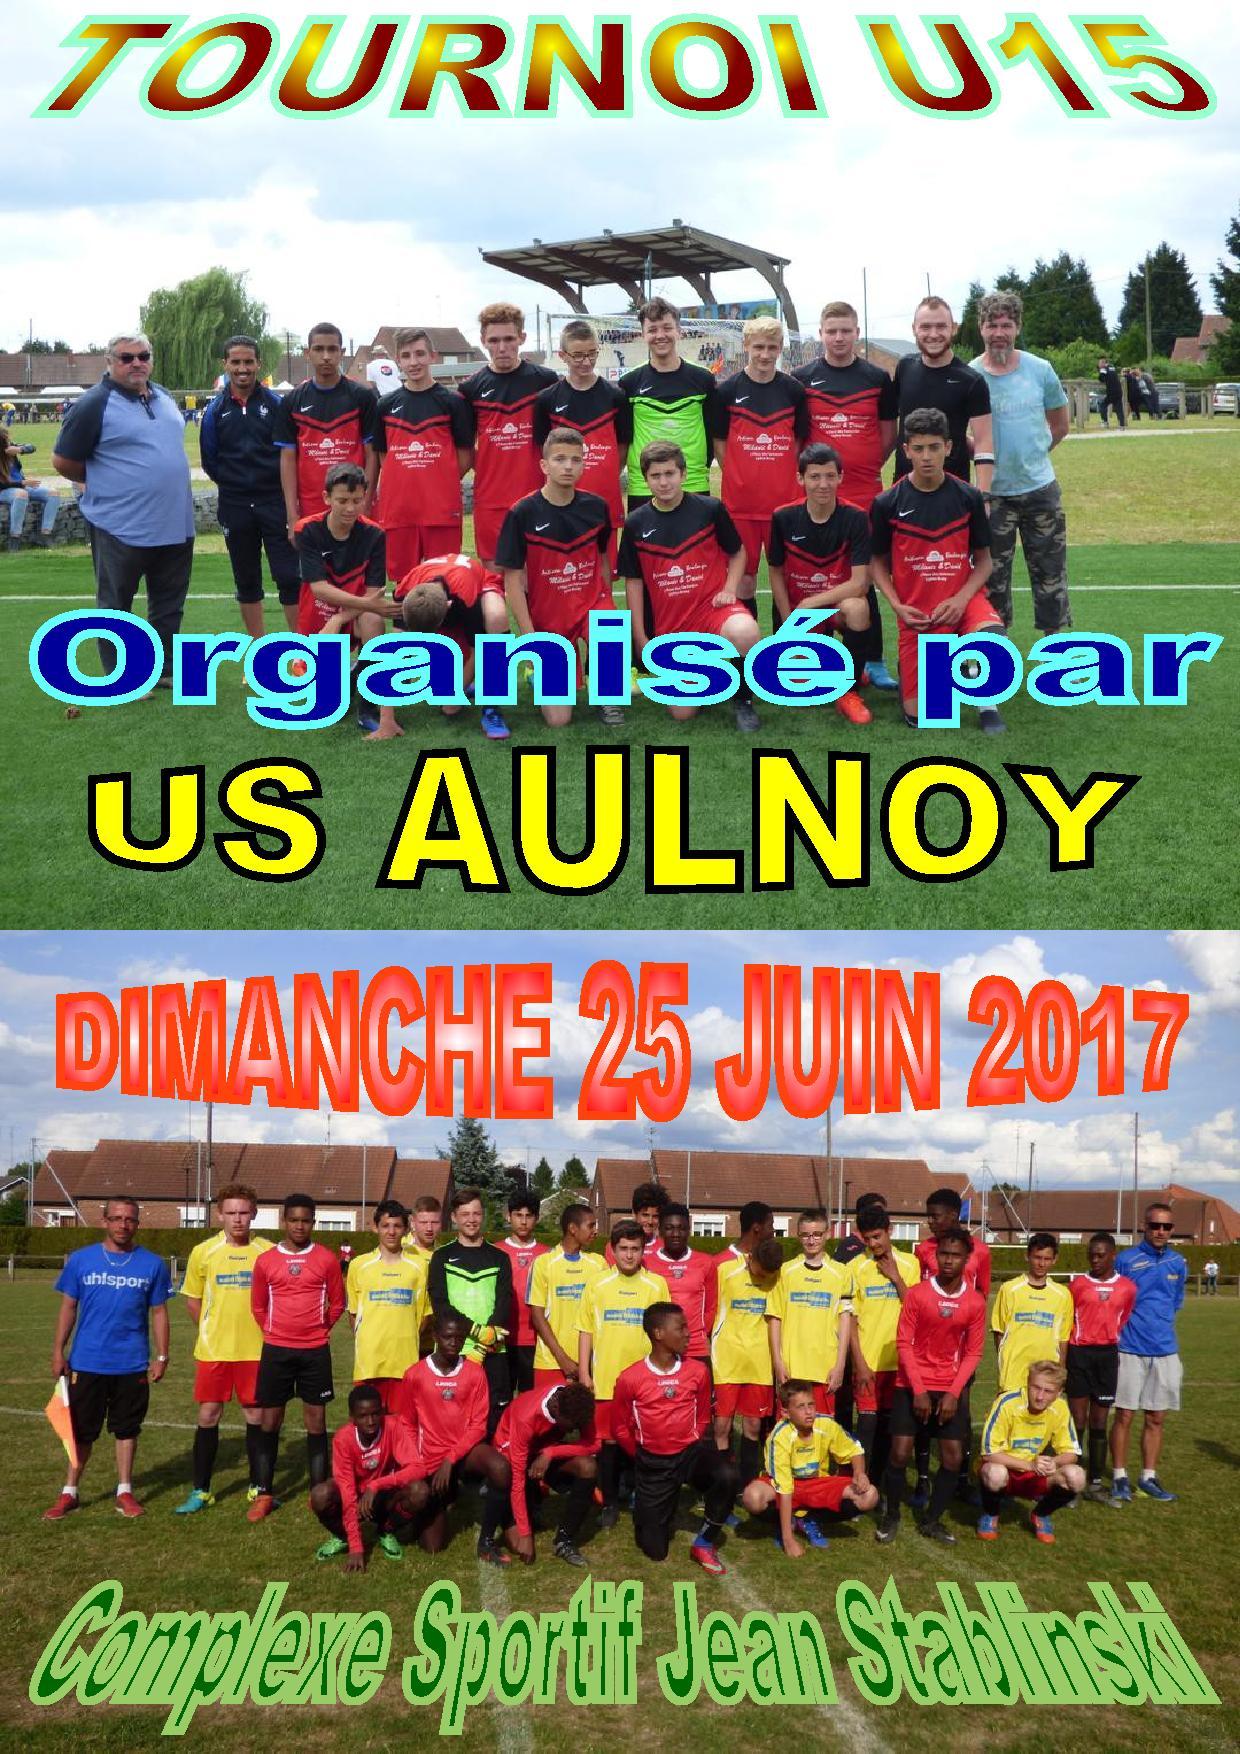 25.06.2017 AFFICHE U15 Tournoi à AULNOY-page-001.jpg